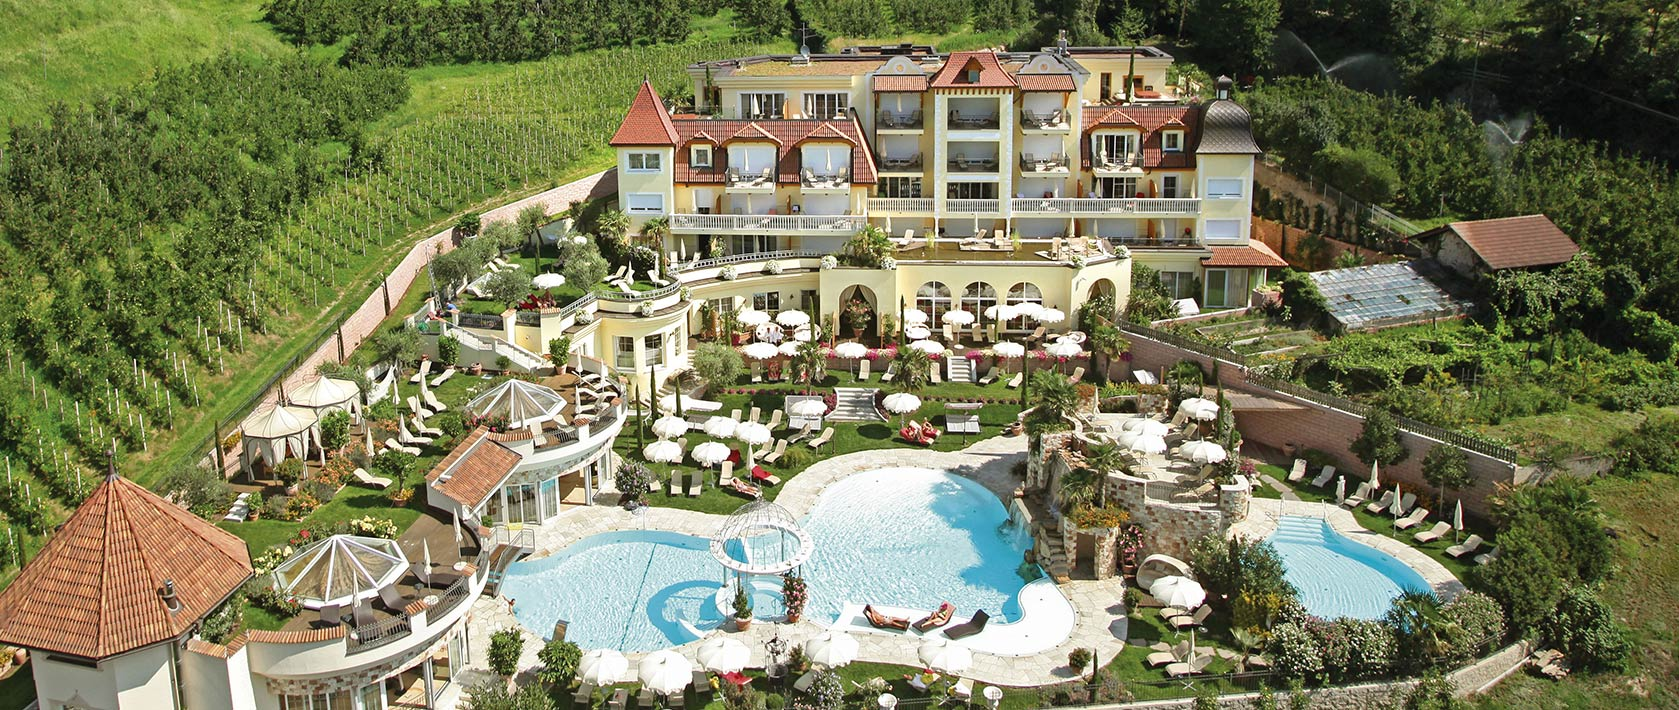 Hotel Preidlhof In Meran In S Dtirol